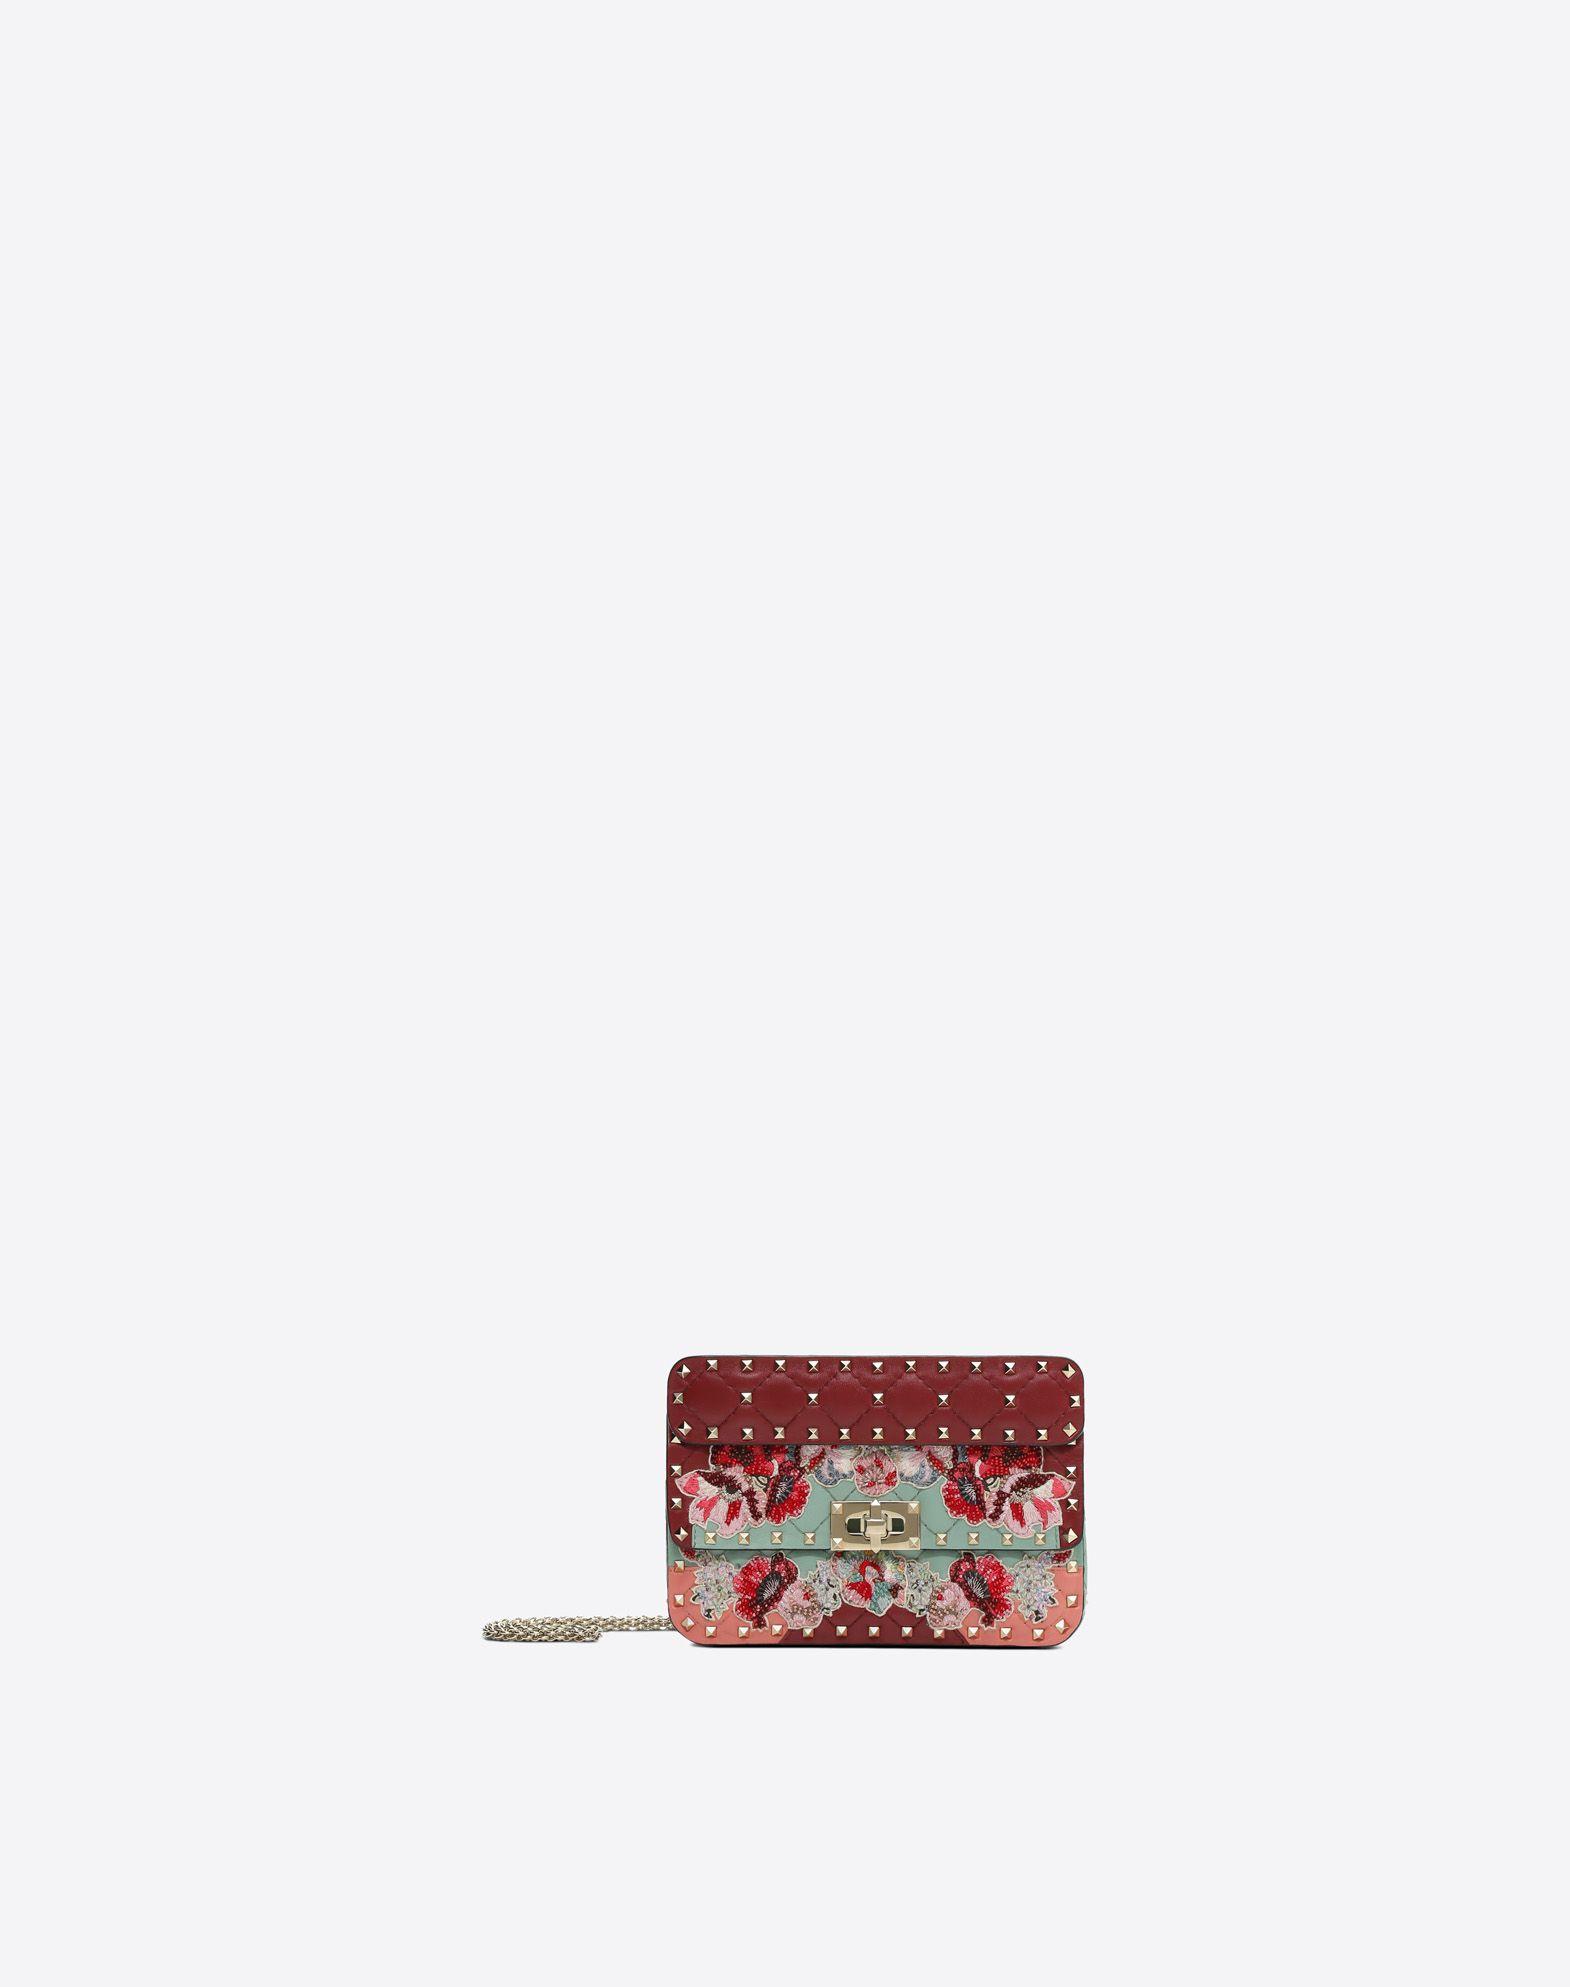 VALENTINO 附品牌标志  13163505ig